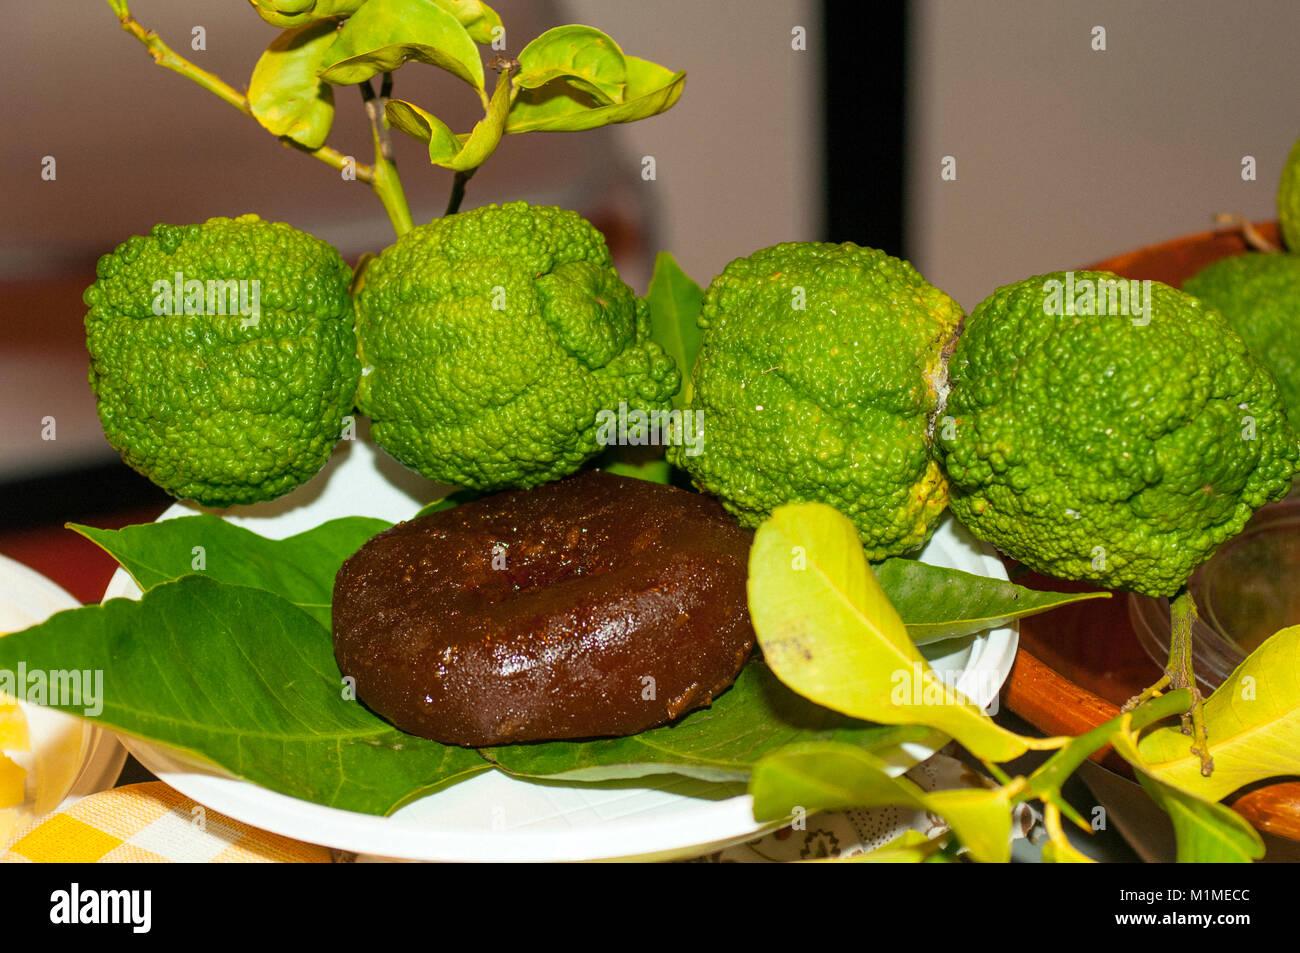 Italy Sardinia  Sa Pompia (Citrus limon var. pompia Camarda ) - Stock Image